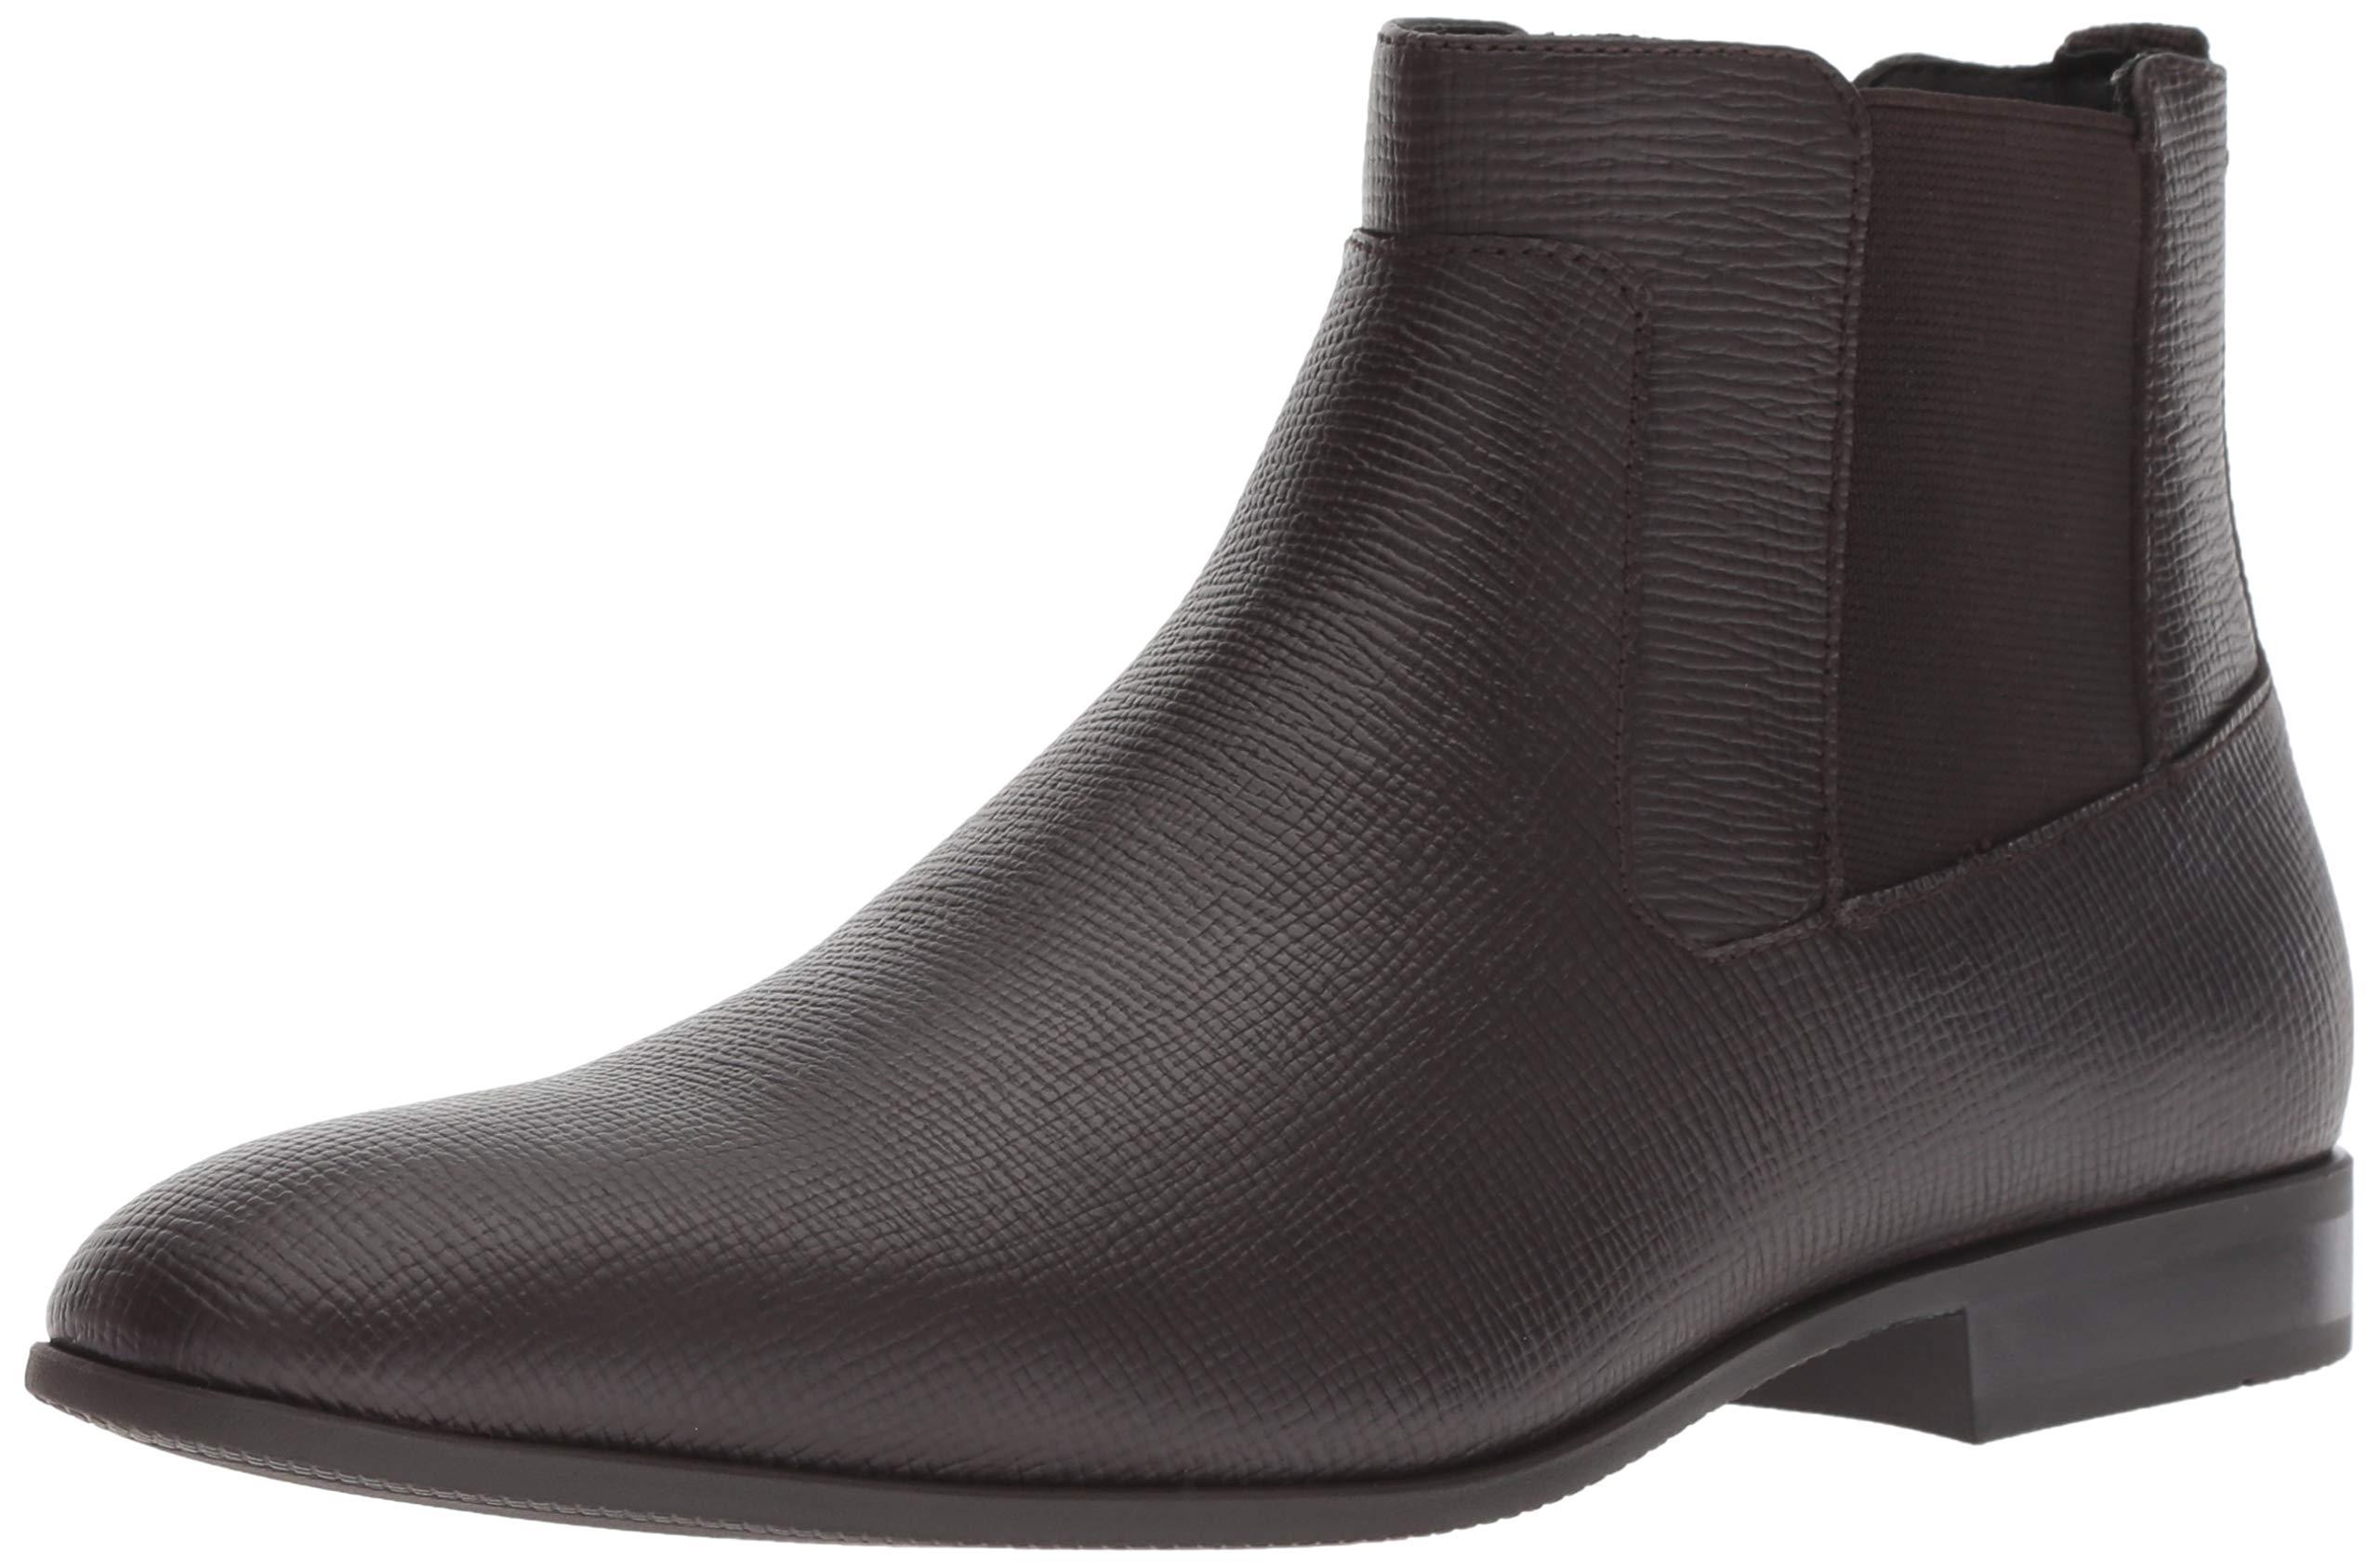 Calvin Klein Men's CHRISTOFF Chelsea Boot Dark Brown Epi Leather 10 M M US